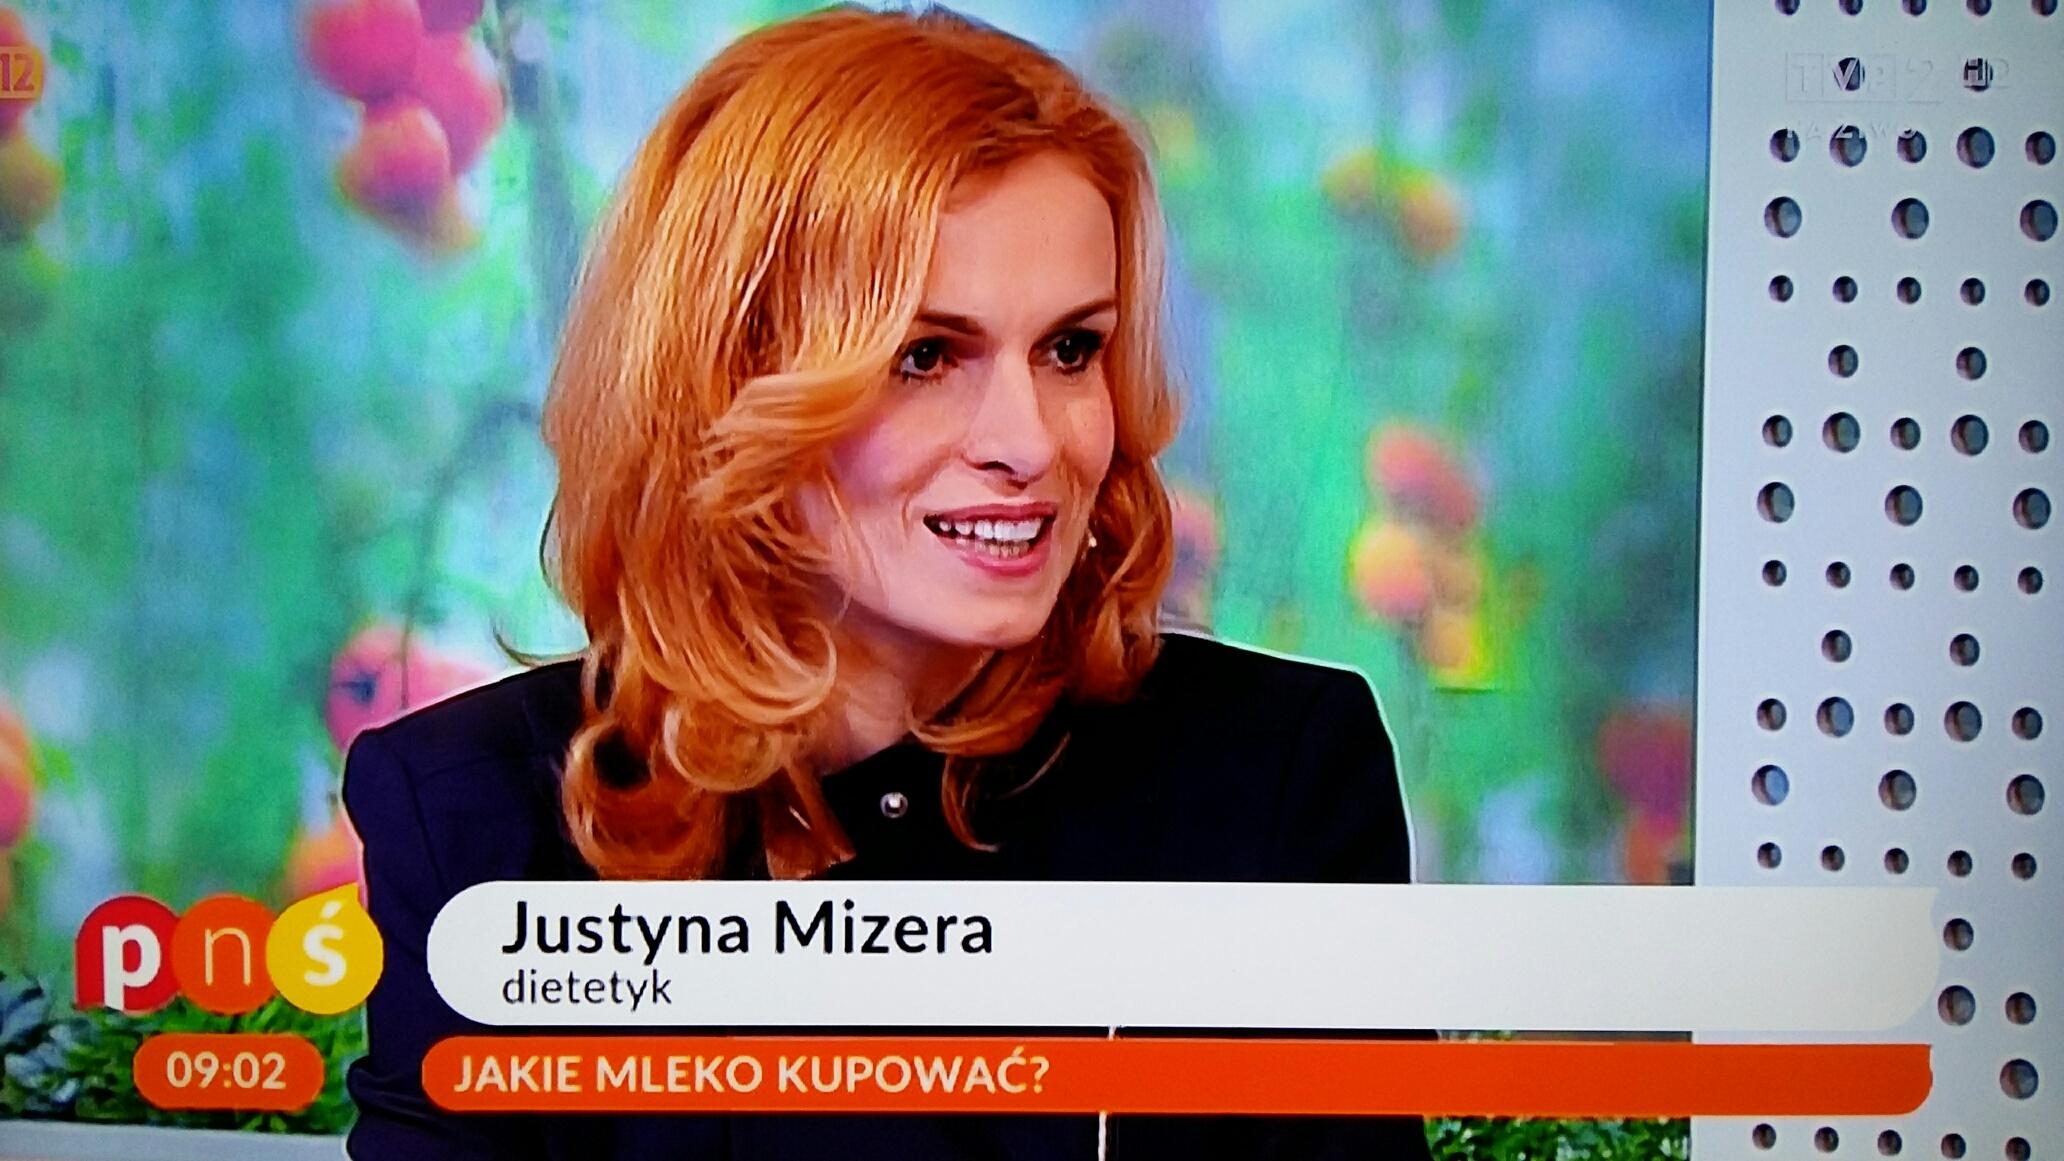 dietetyk gwiazd Justyna Mizera